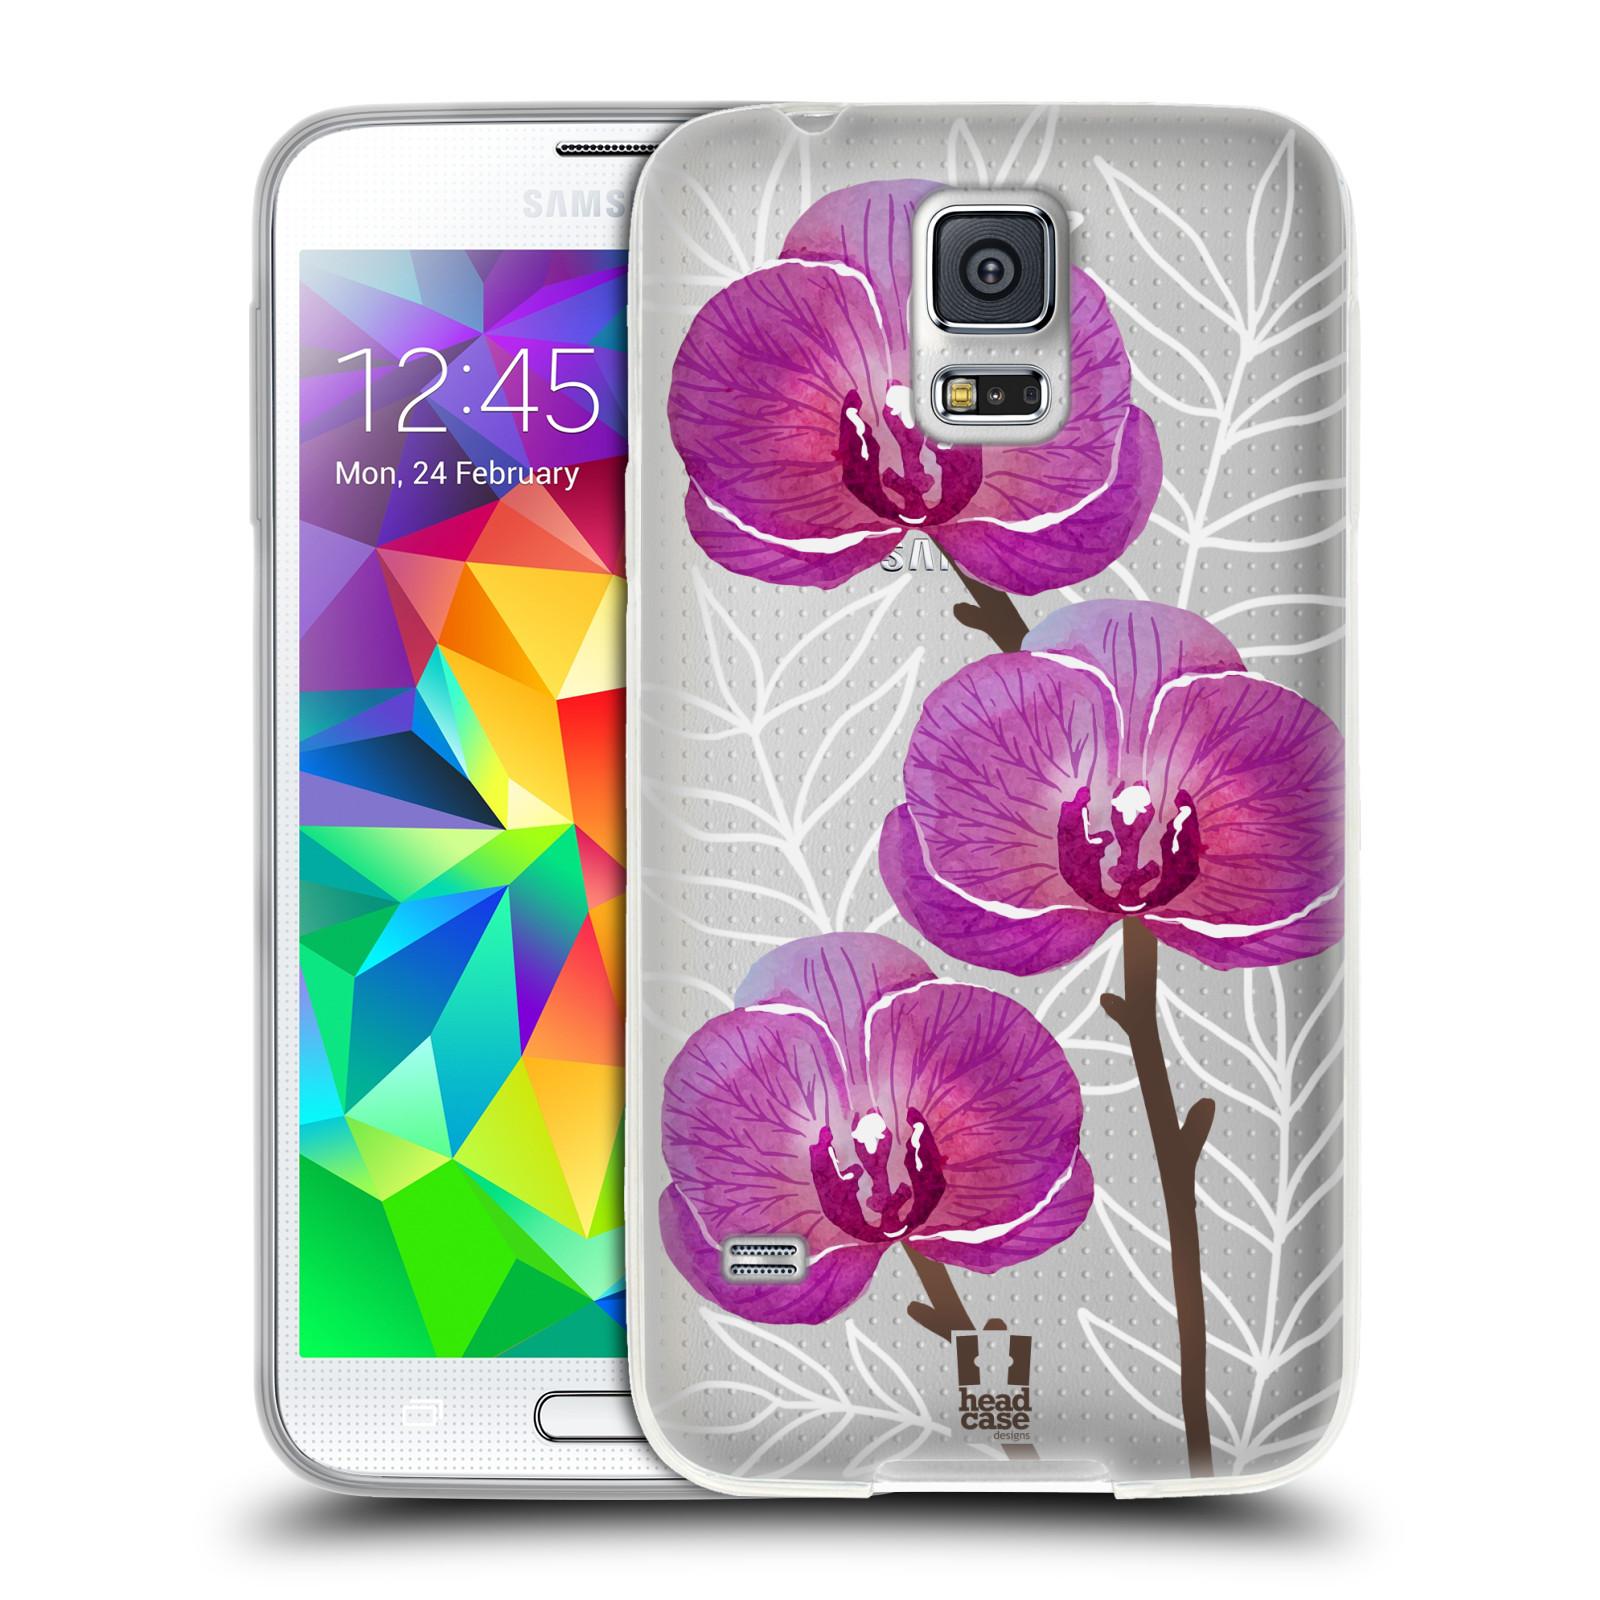 Silikonové pouzdro na mobil Samsung Galaxy S5 - Head Case - Hezoučké kvítky - průhledné